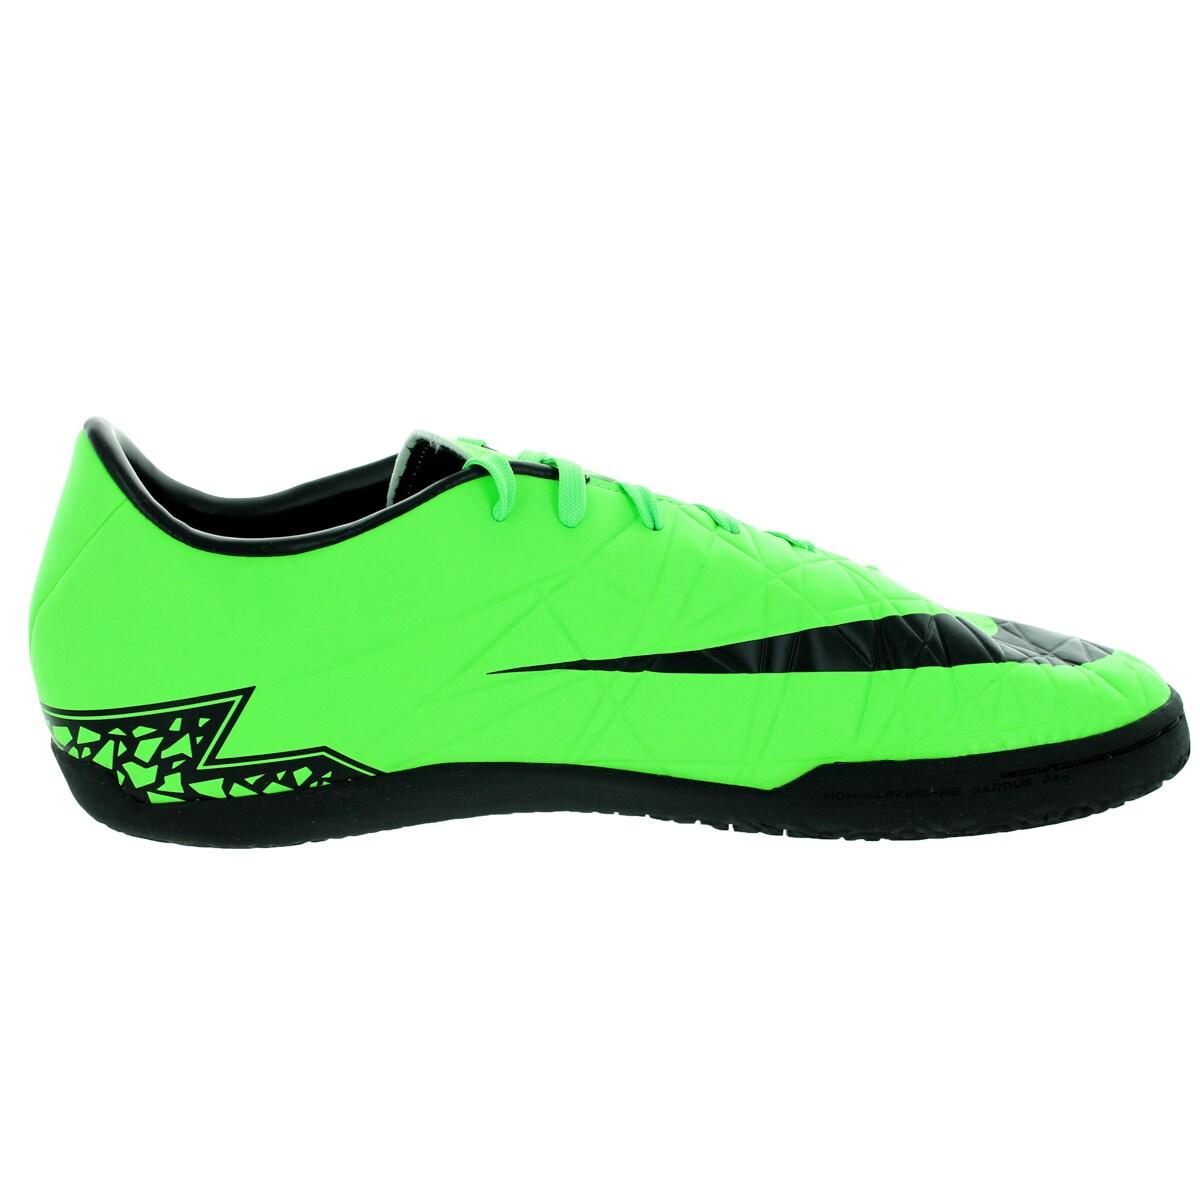 2b338bdd1 Shop Nike Men's Hypervenom Phelon Ii Ic Green Strike/Black/Black Indoor  Soccer Shoe - Free Shipping Today - Overstock - 12118258